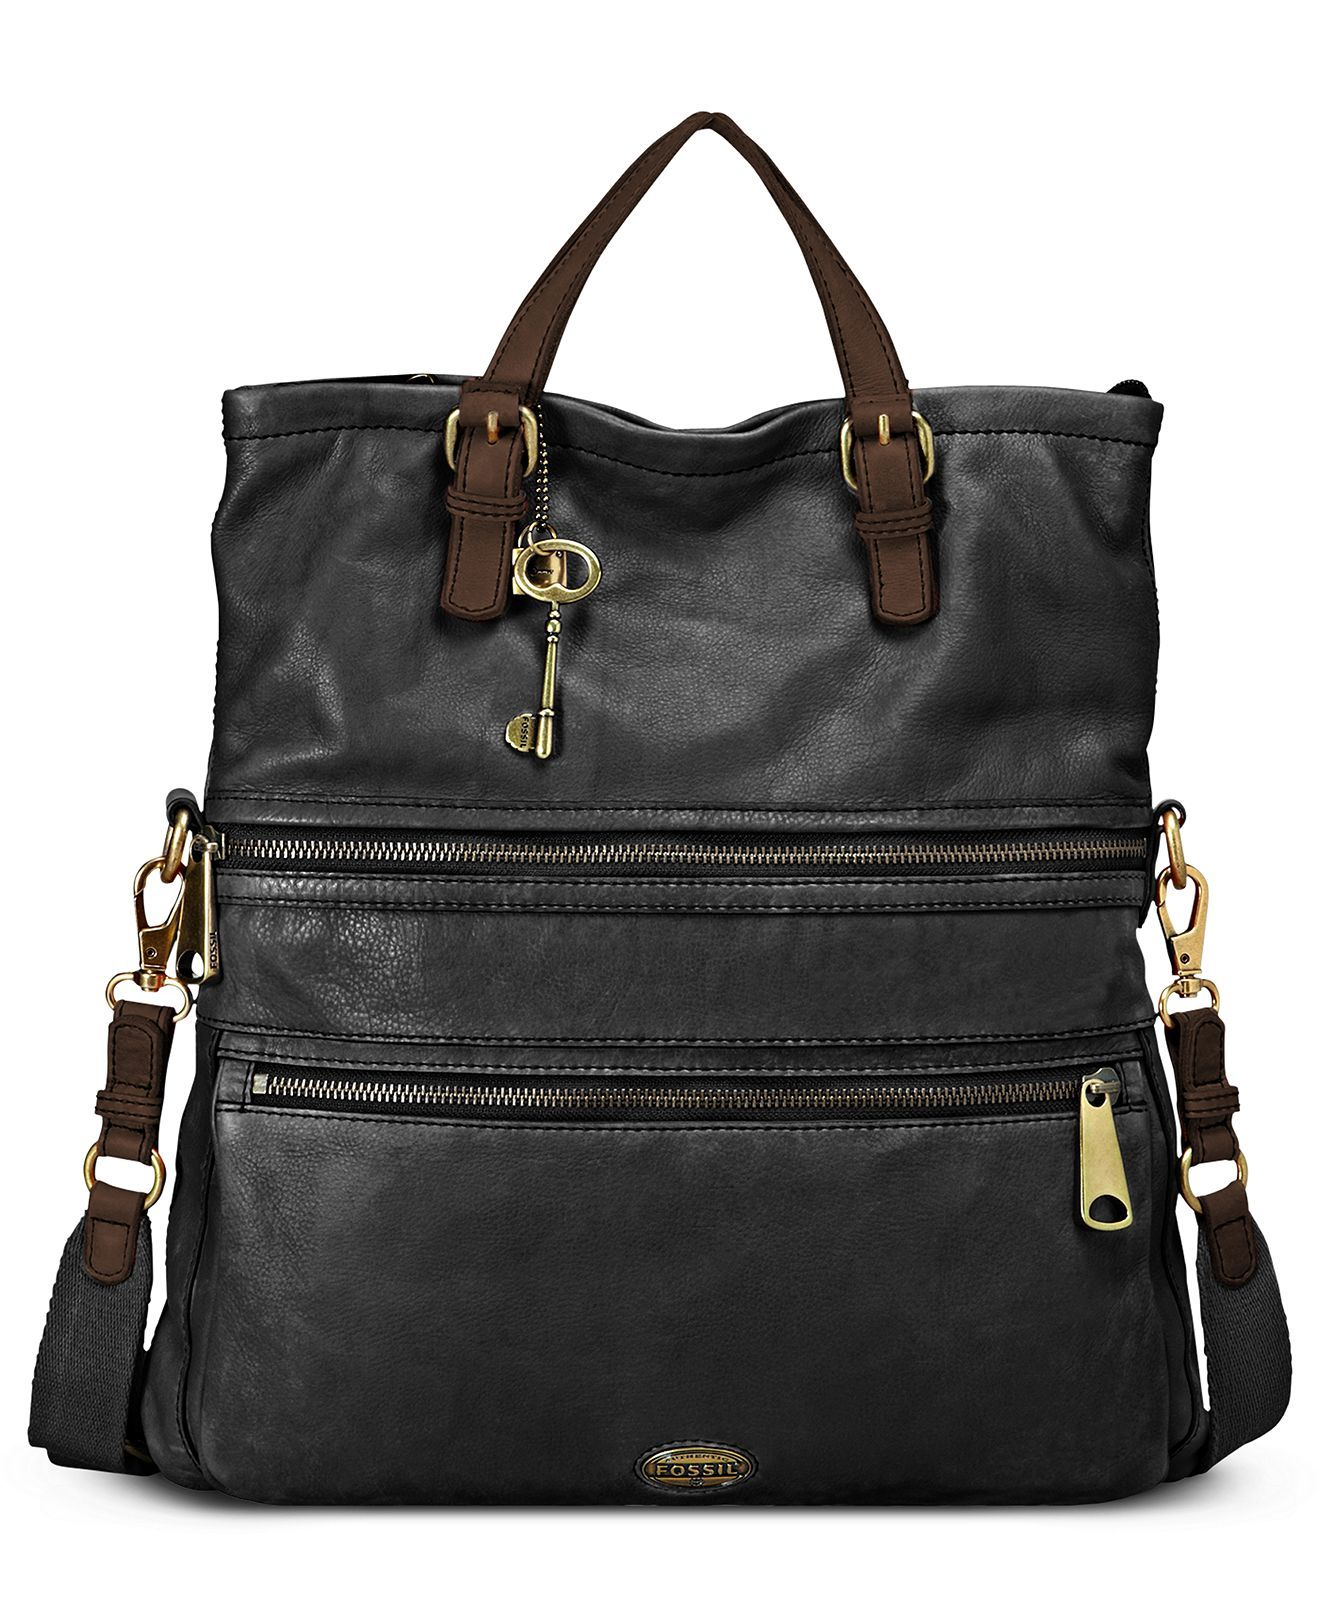 55d73797e115ac Fossil Handbag, Explorer Leather Tote - Fossil - Handbags & Accessories -  Macys